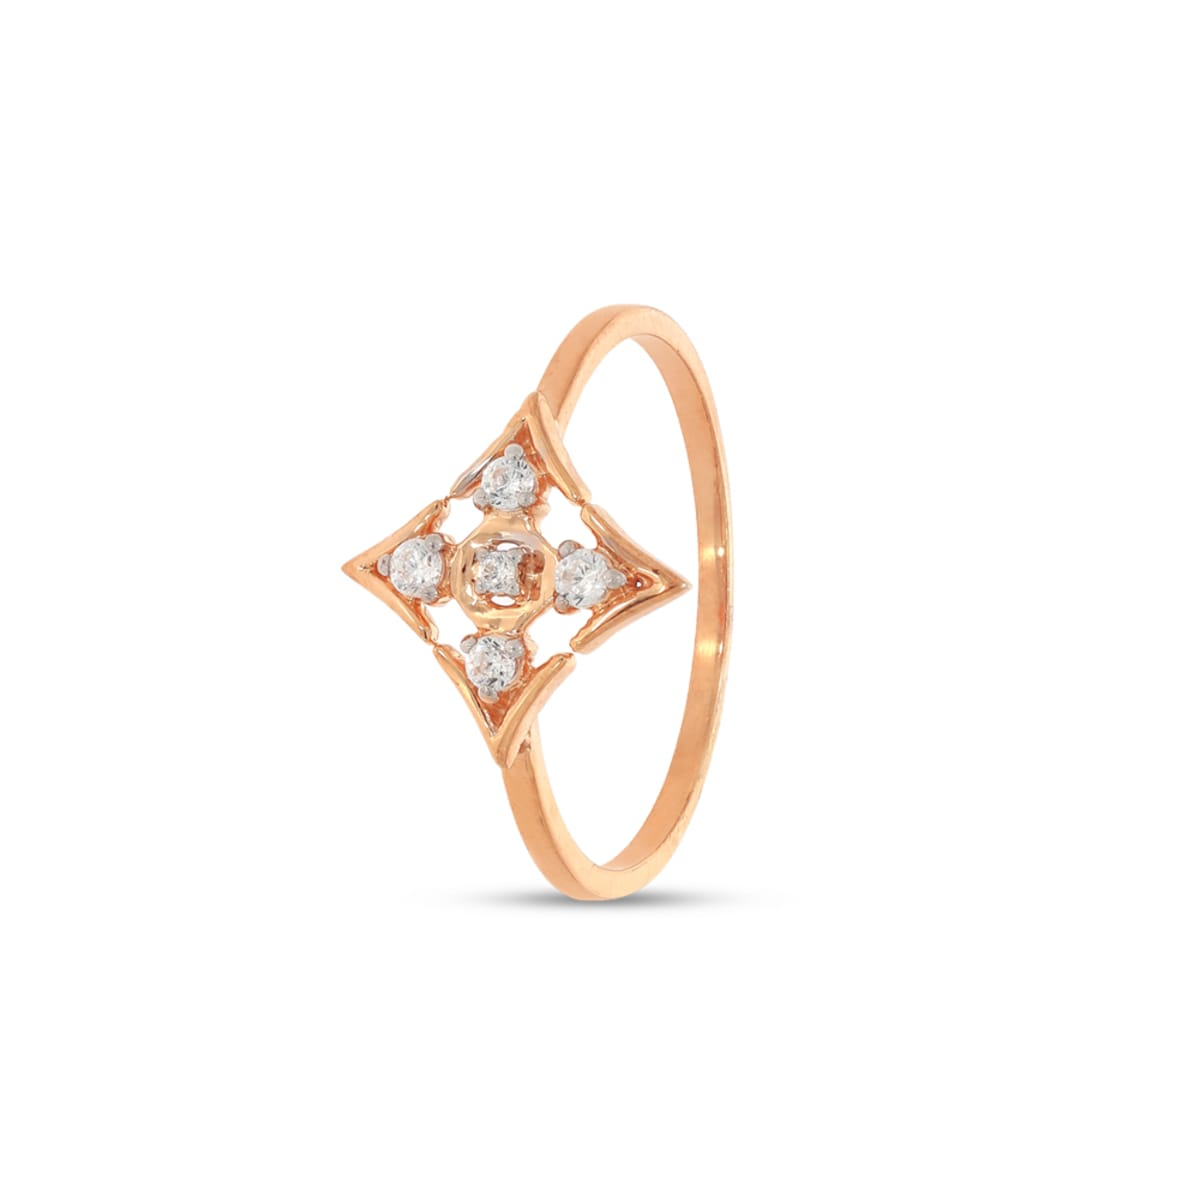 Real Diamond Ring 21